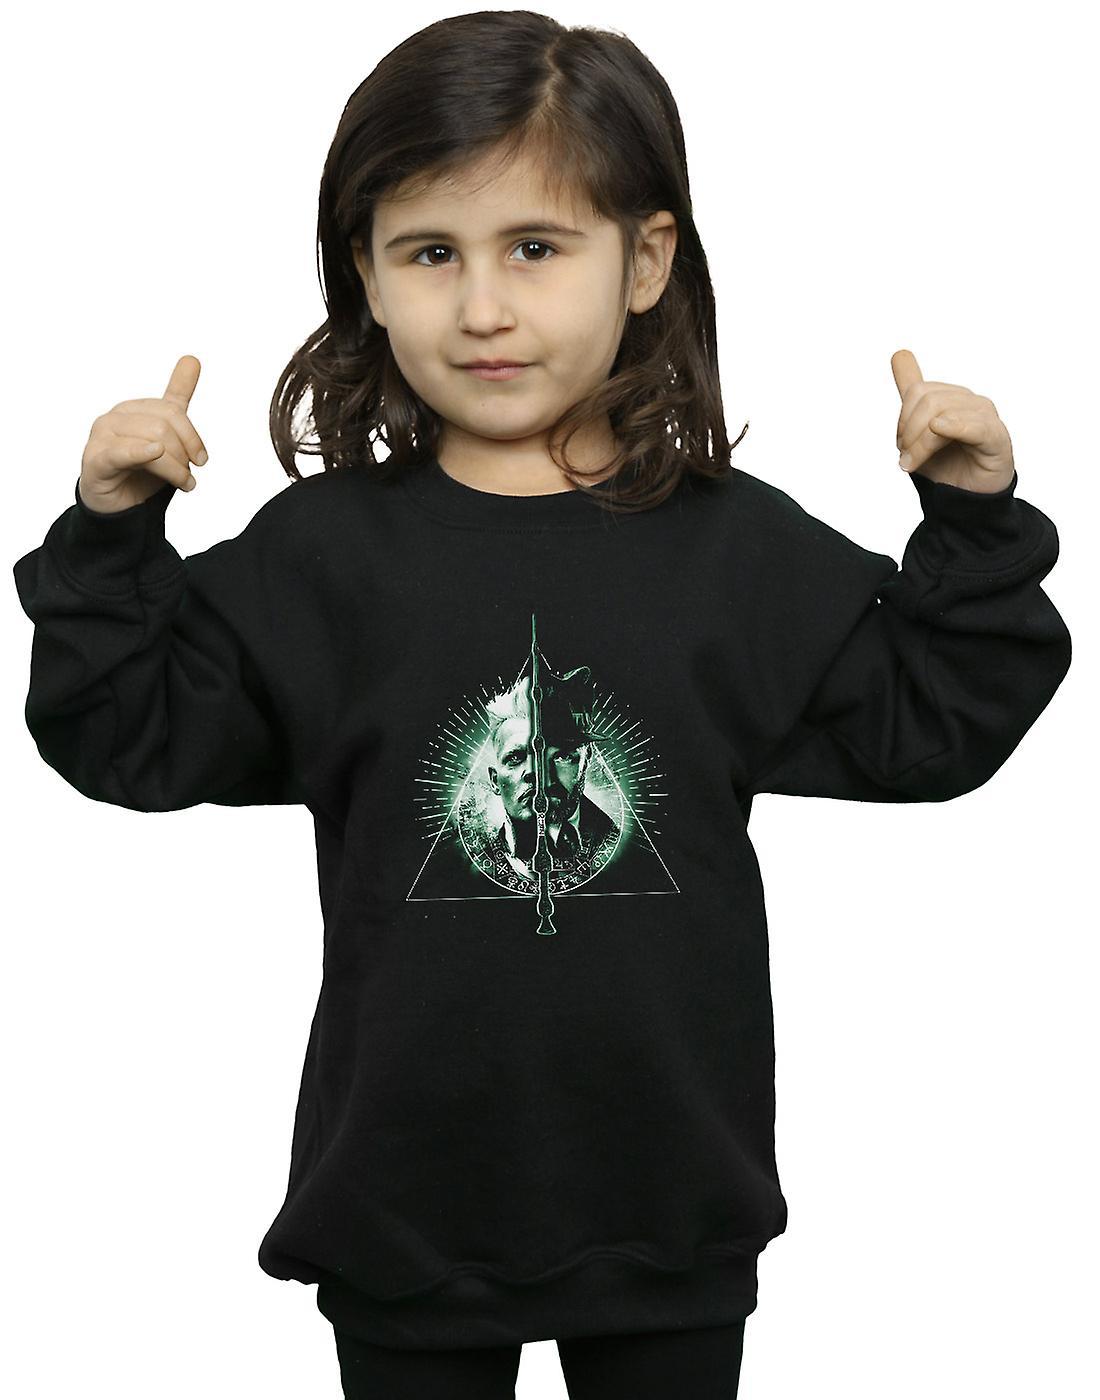 Fantastic Beasts Girls Dumbledore Vs Grindelwald Sweatshirt